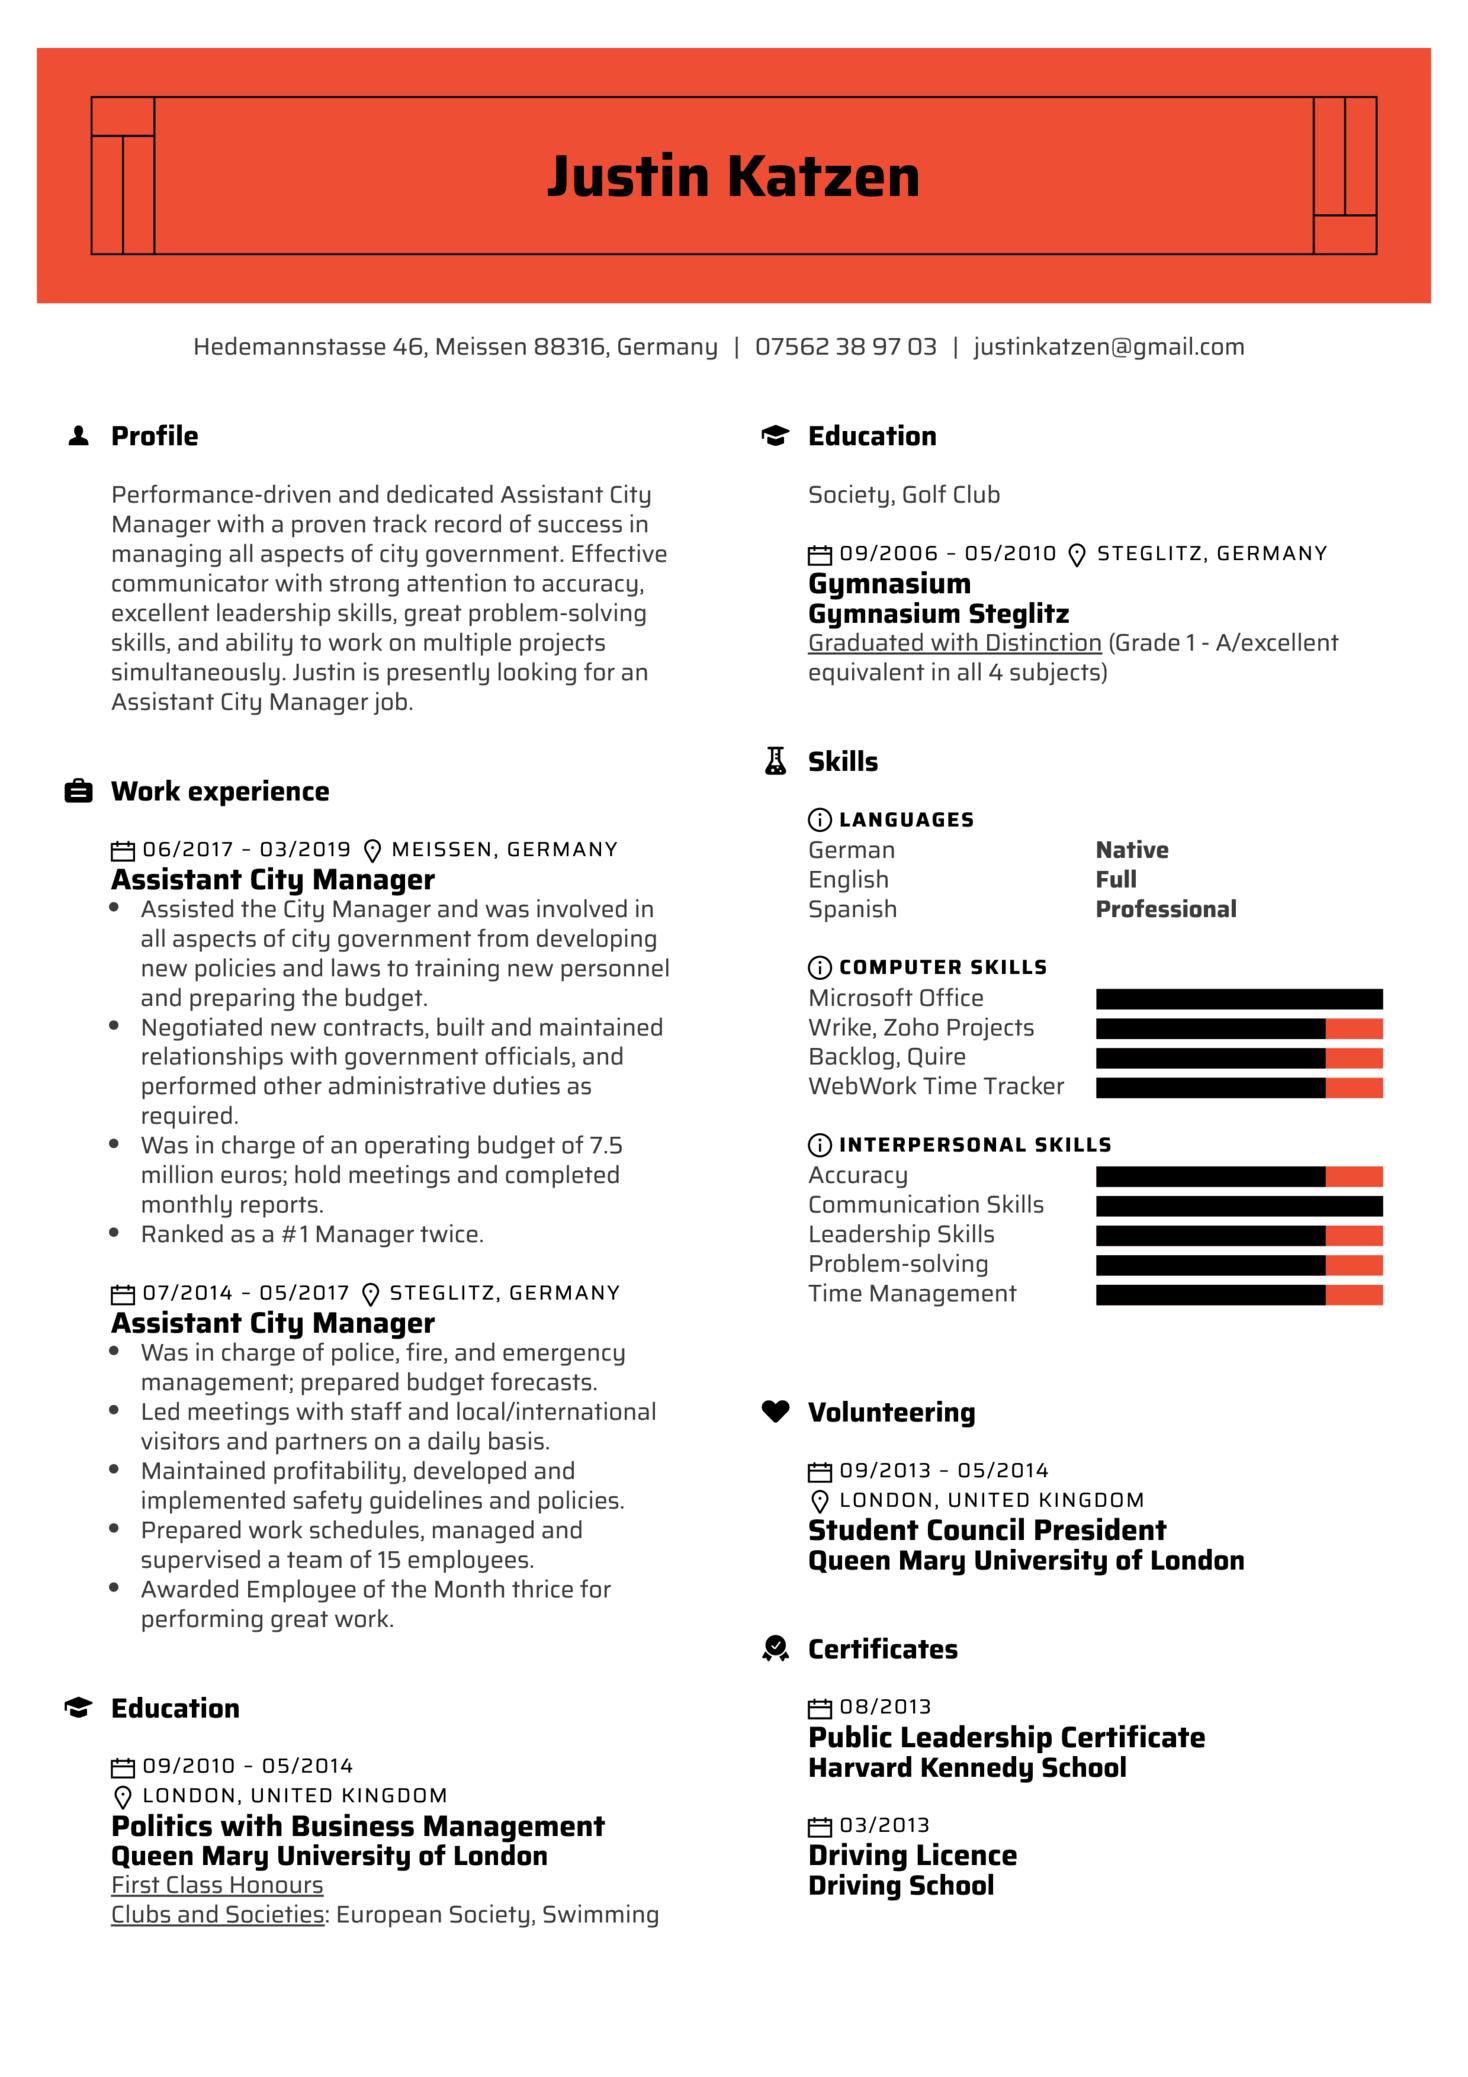 Assistant City Manager Resume Example (časť 1)